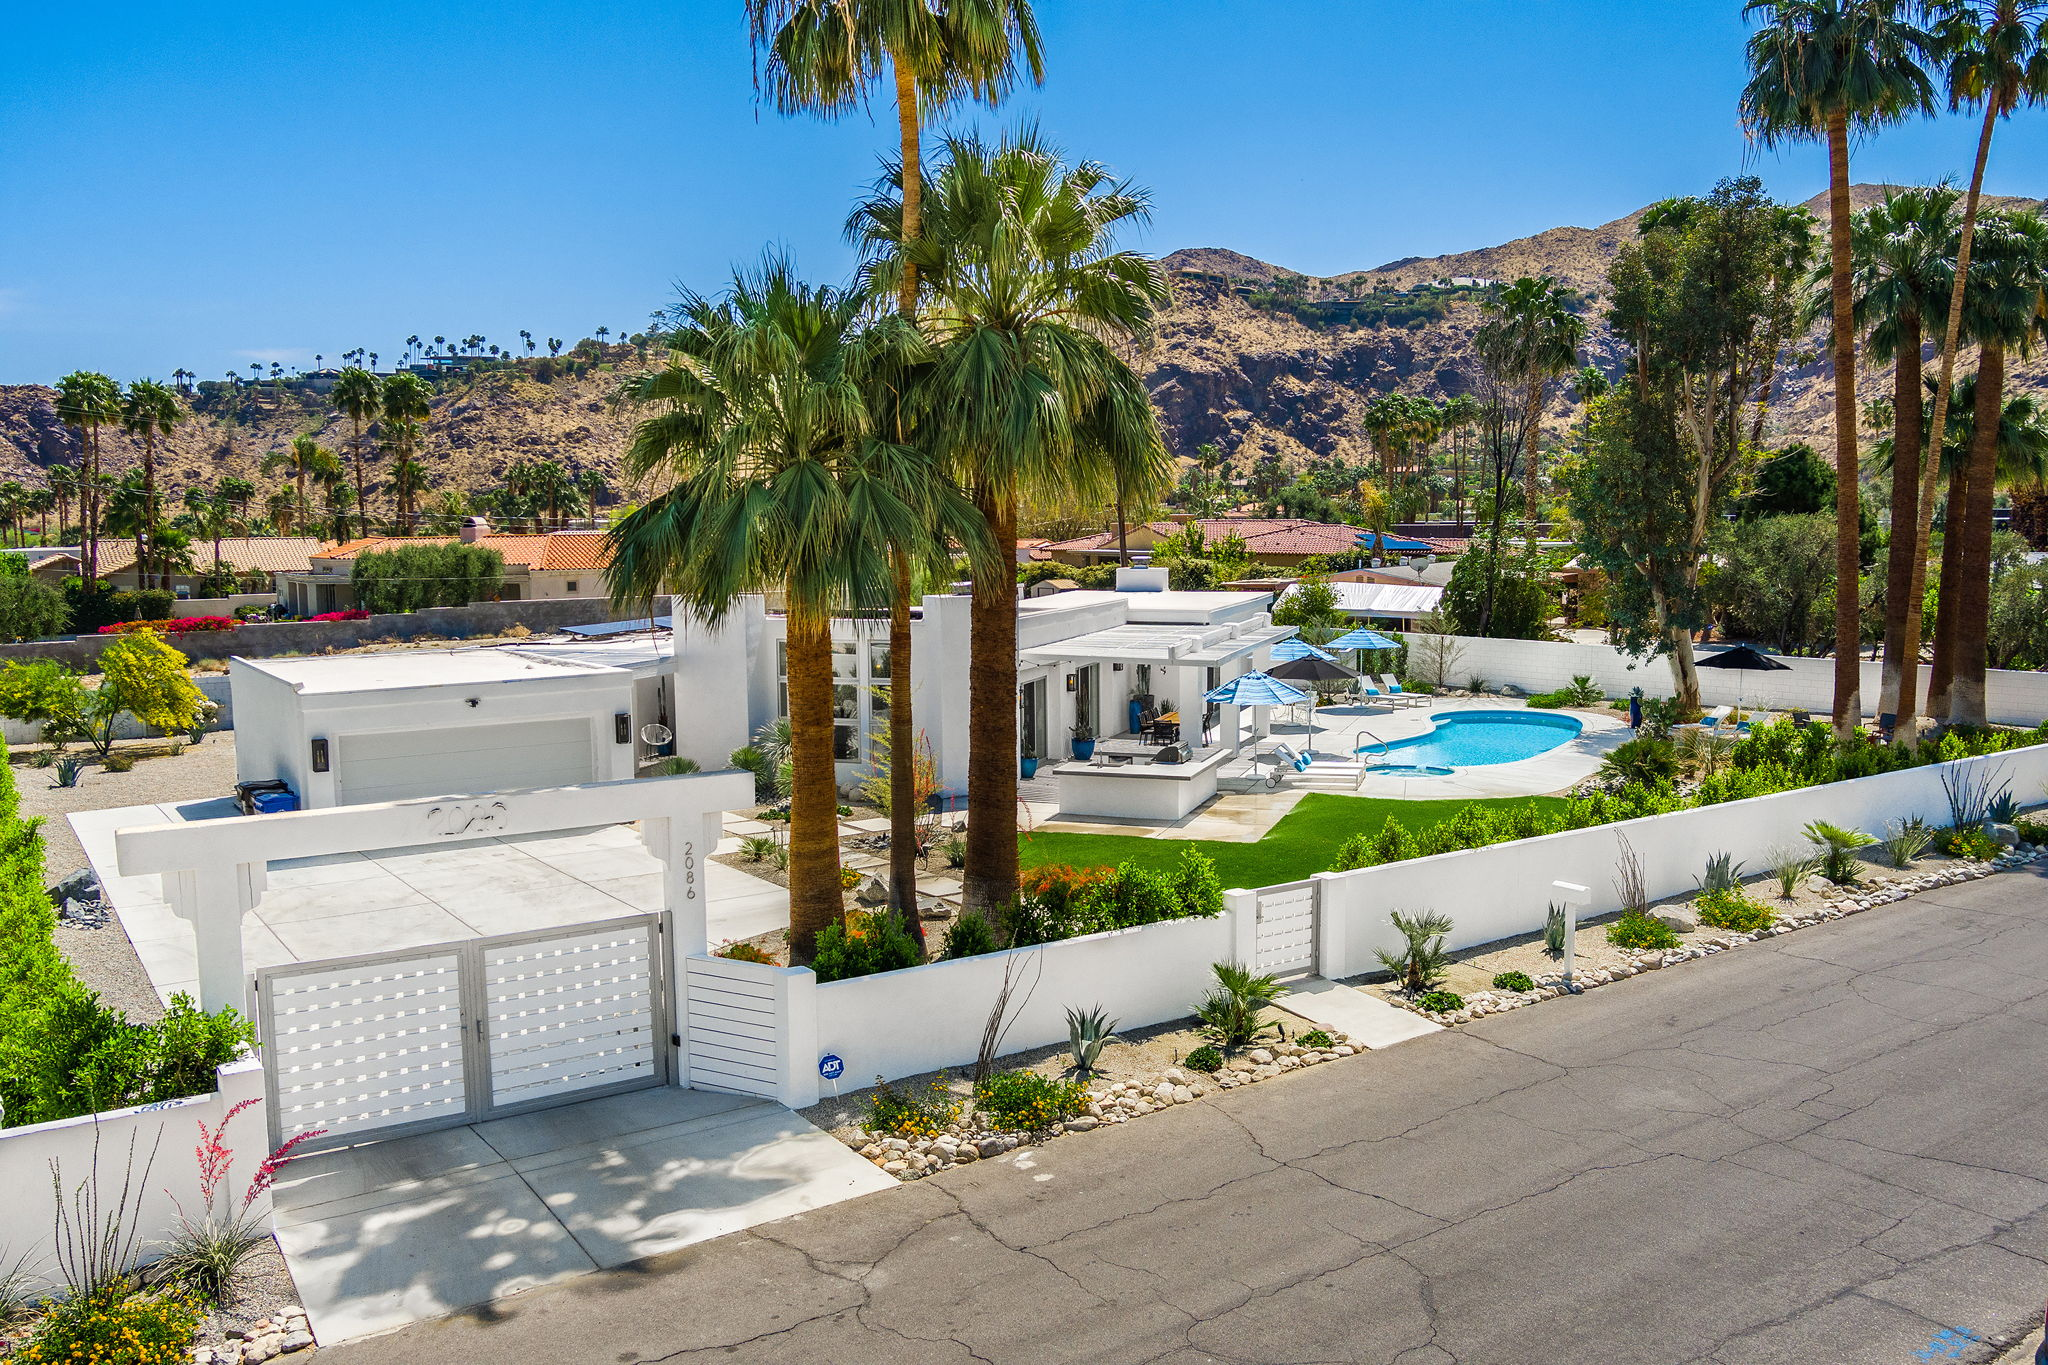 2086 S Barona Rd, Palm Springs, CA 92264, US